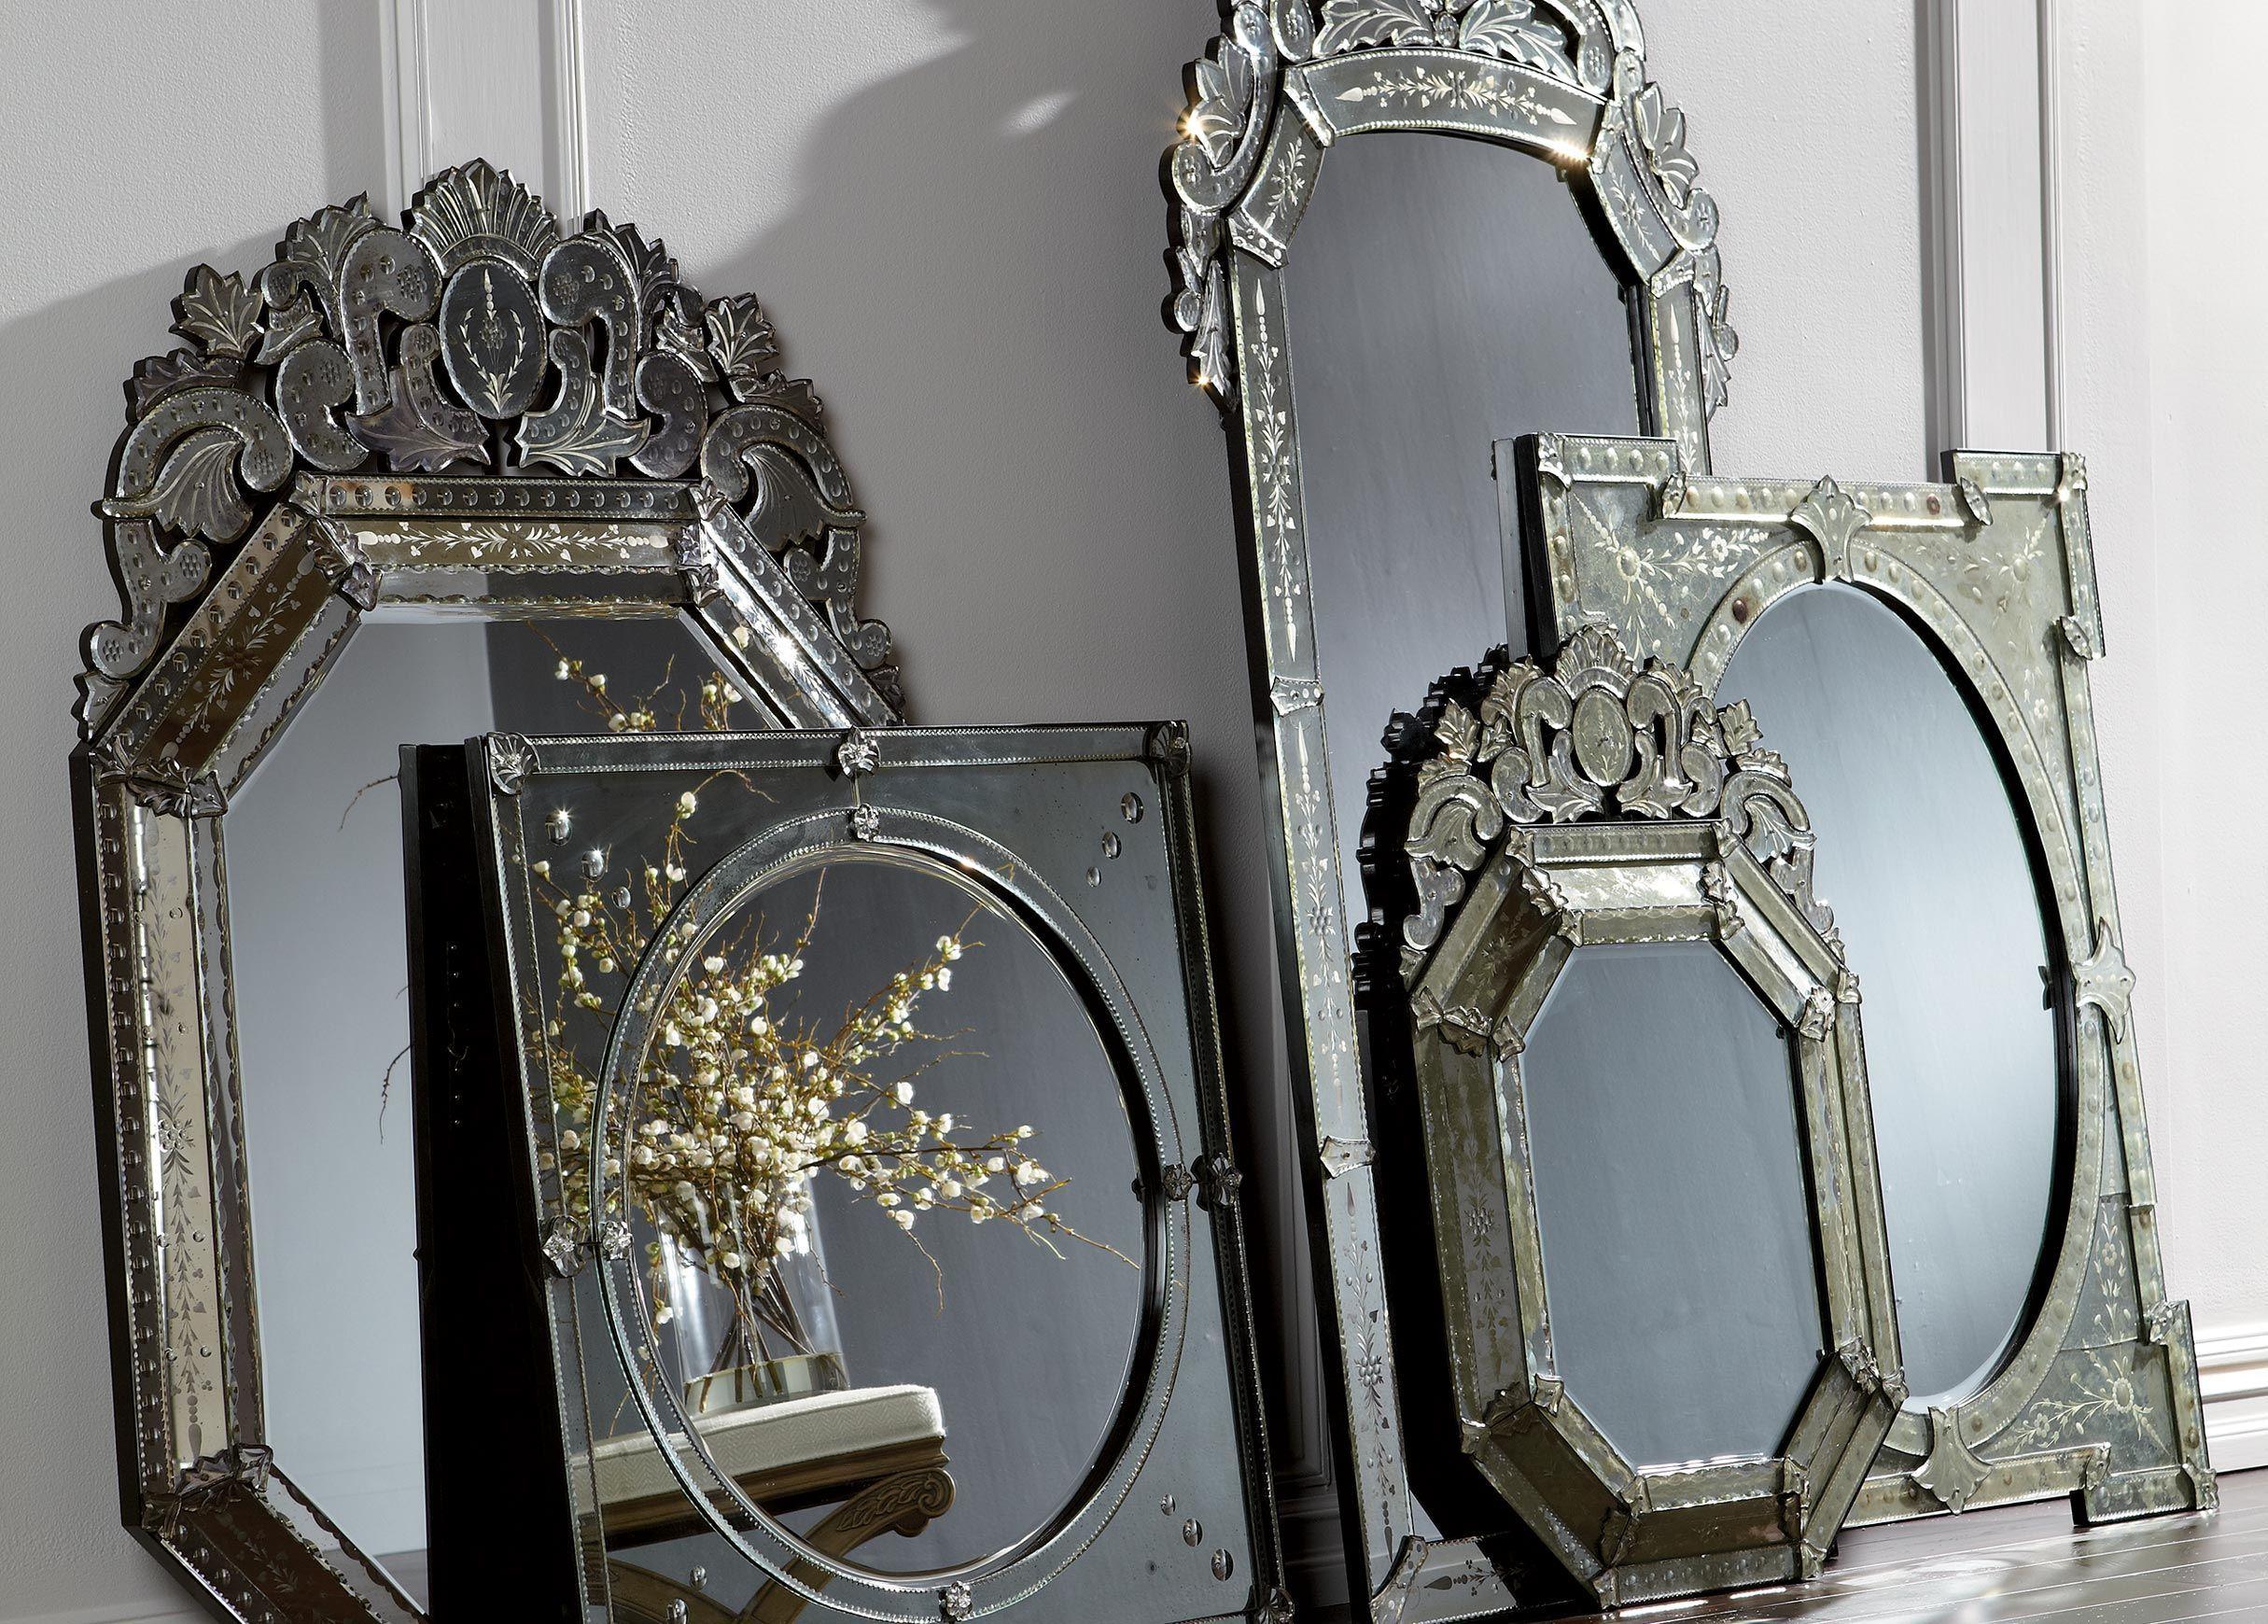 Large Ornate Venetian Mirror Mirrors Venetian Mirrors Mirror Mirror Decor